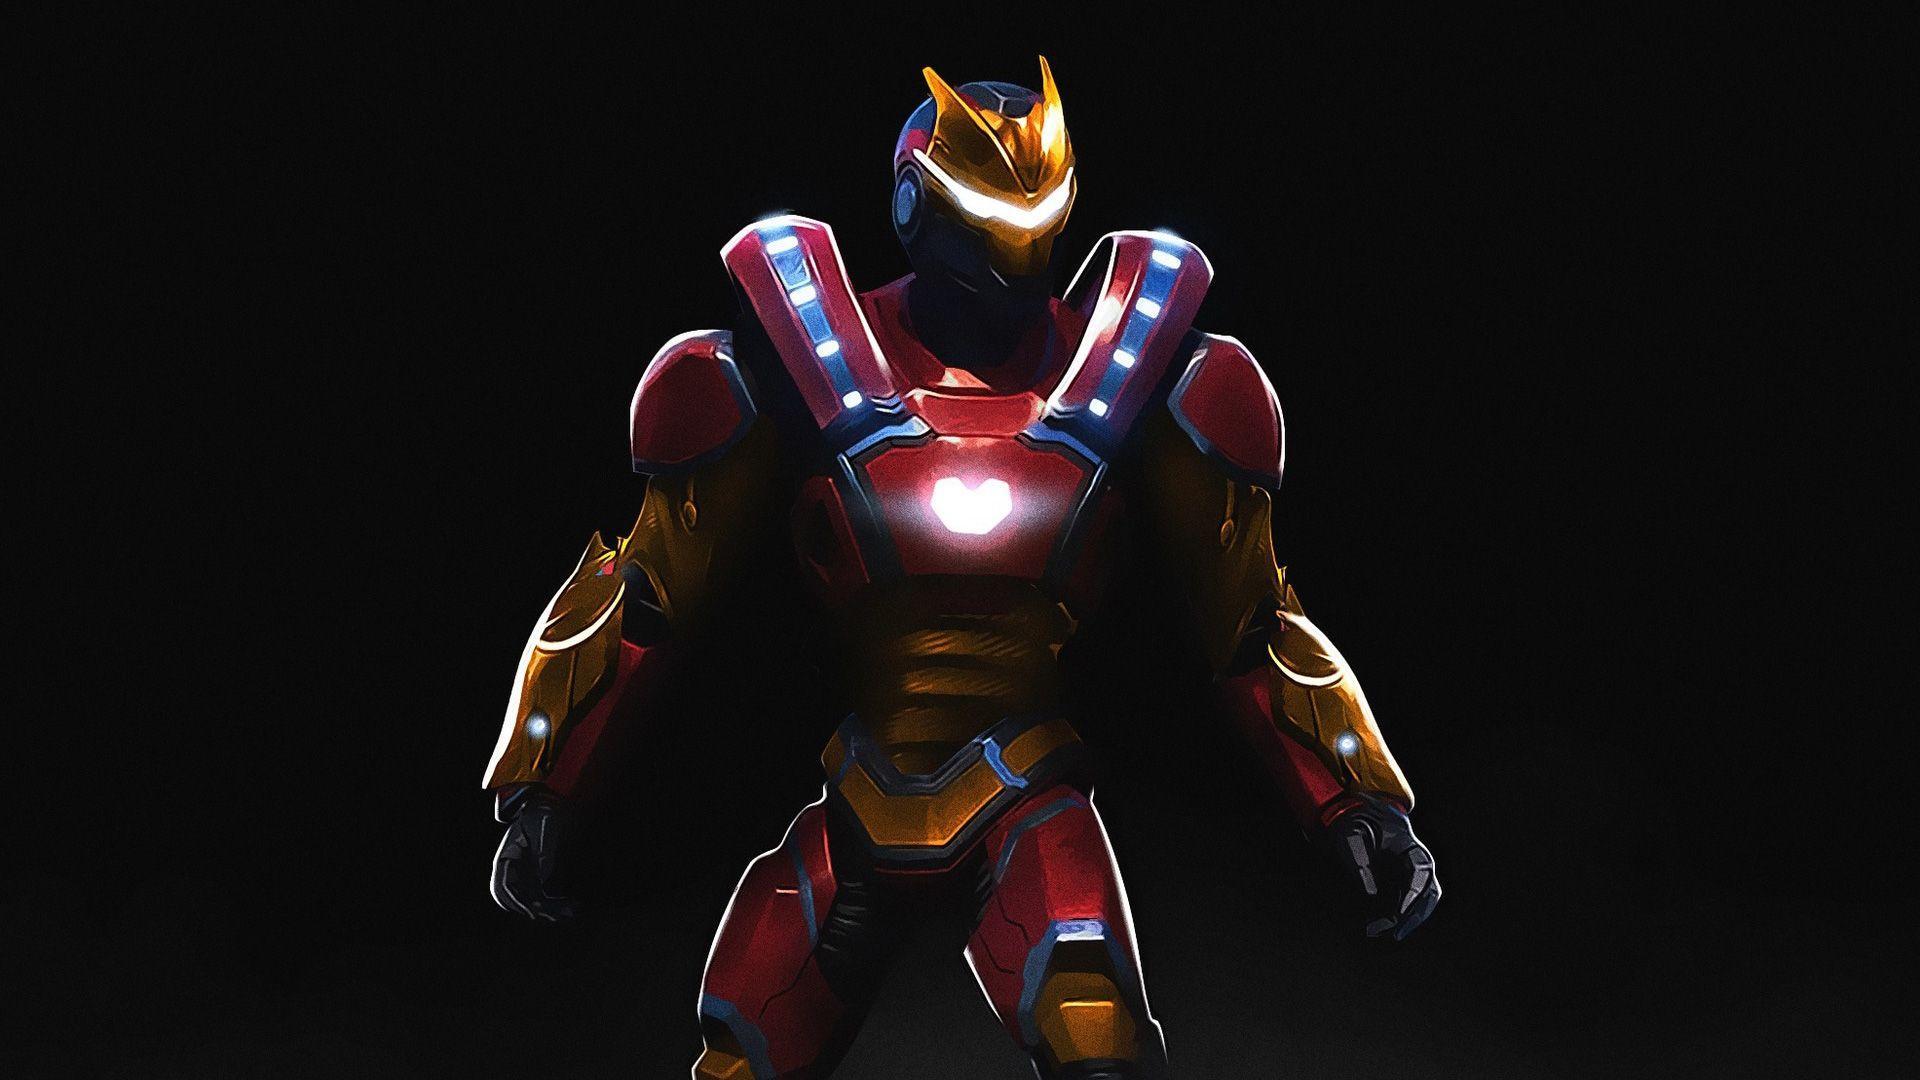 Carbide Iron Man Fortnite Fortnite Marvel Wallpapers Top Free Fortnite Marvel Backgrounds Wallpaperaccess